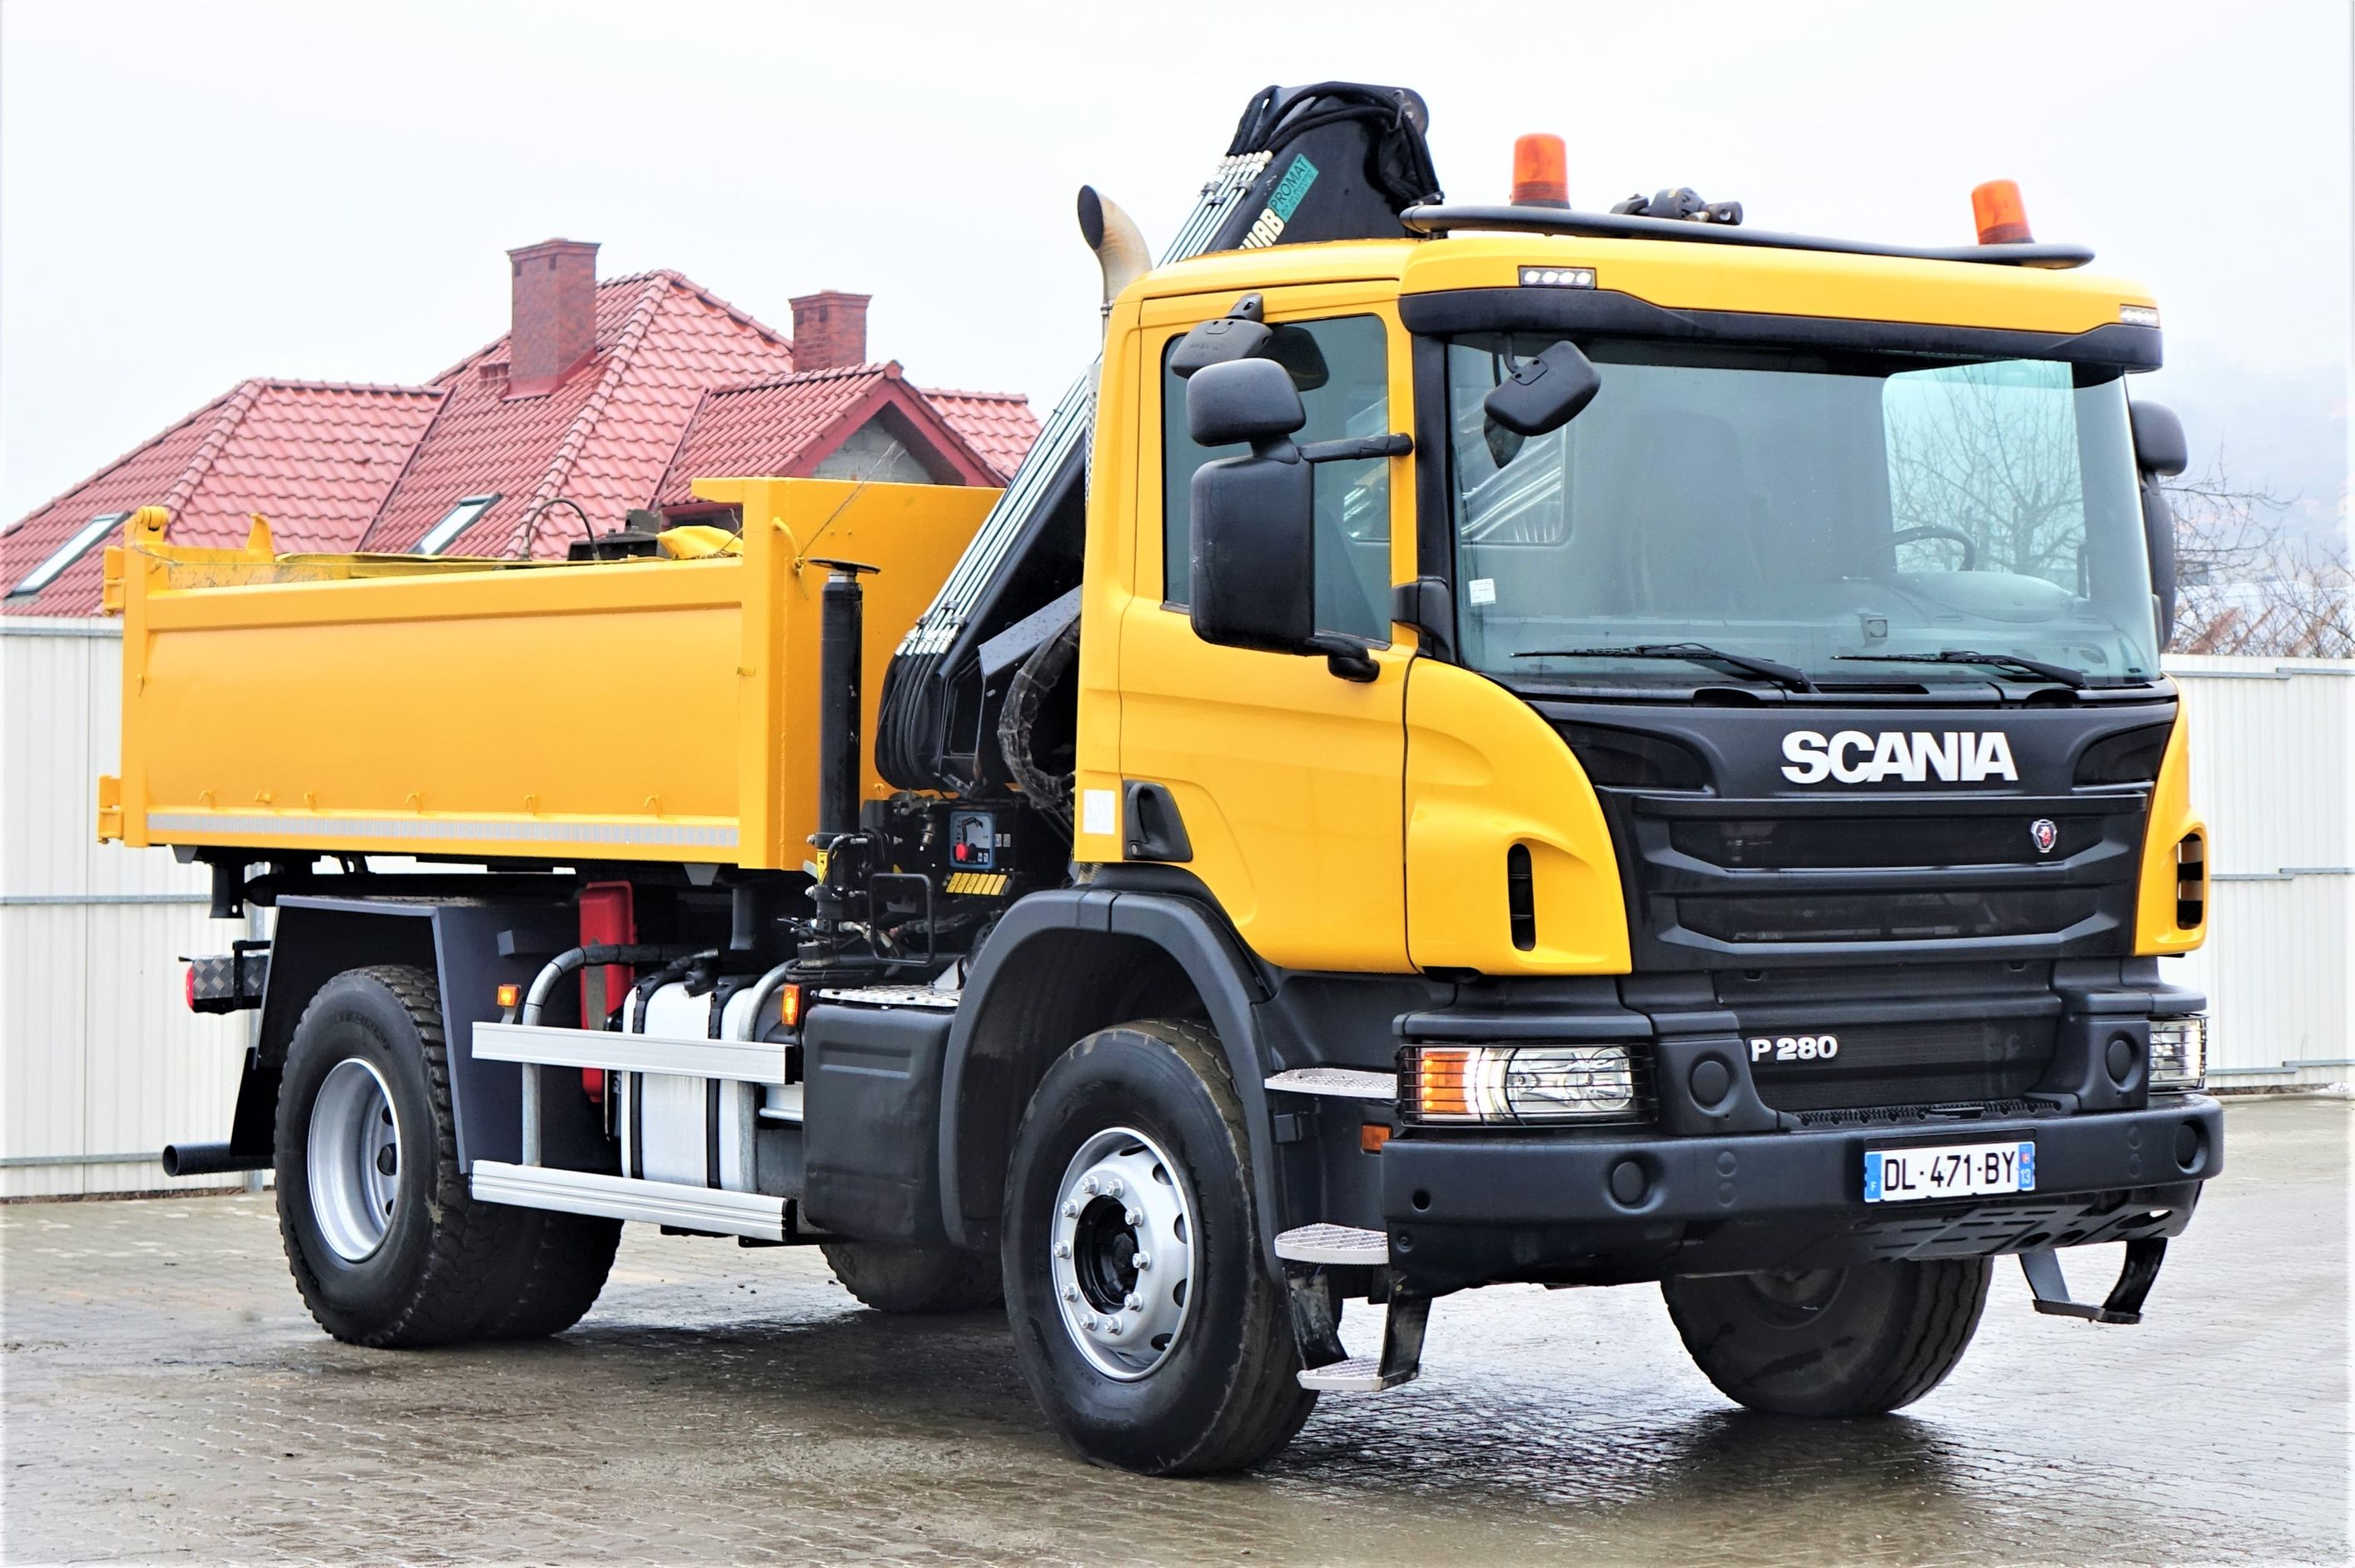 2015-scania-p280-17711613